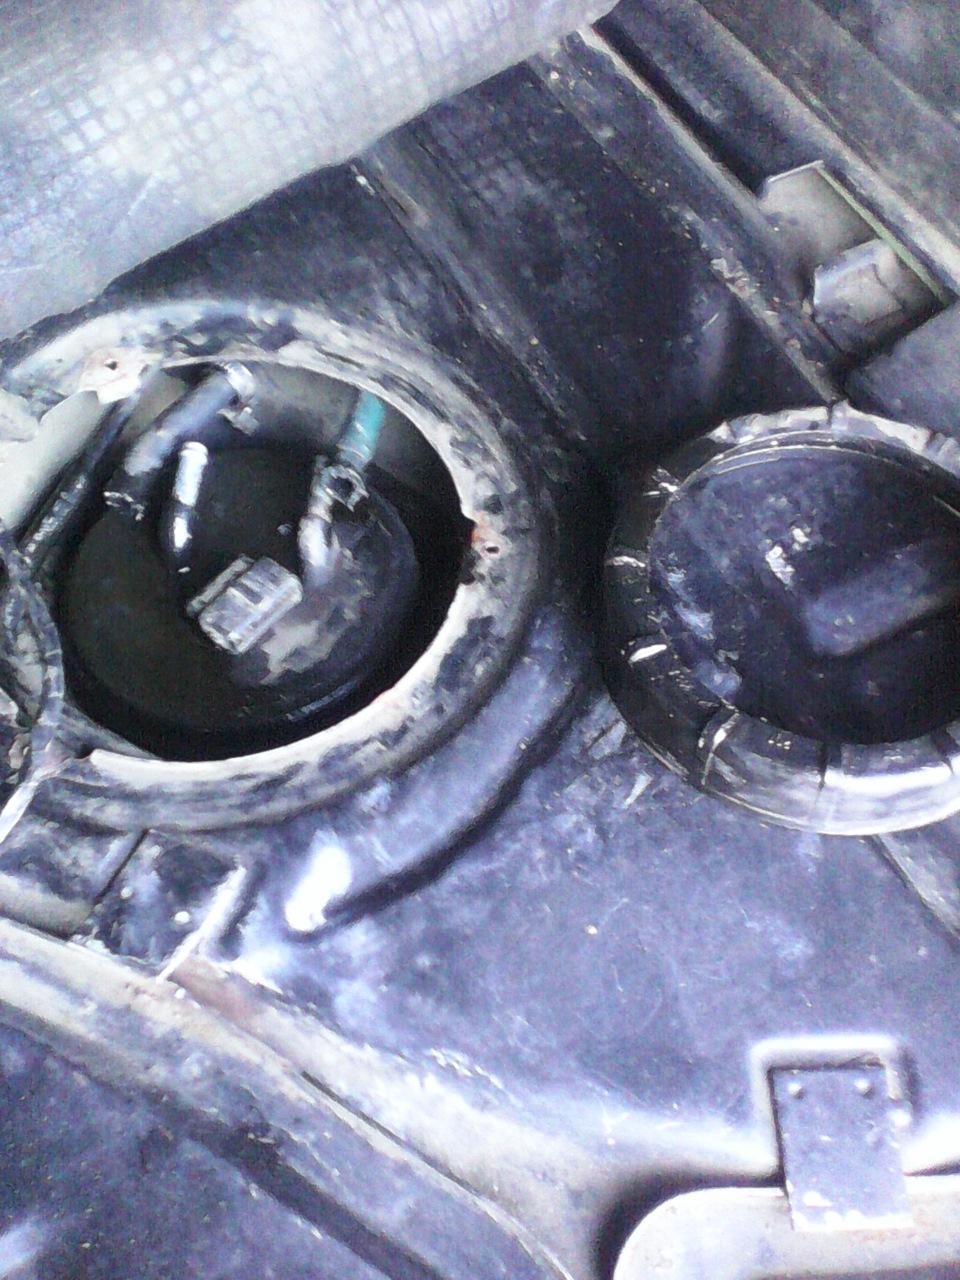 бензонасос volkswagen passat схема насоса бензин